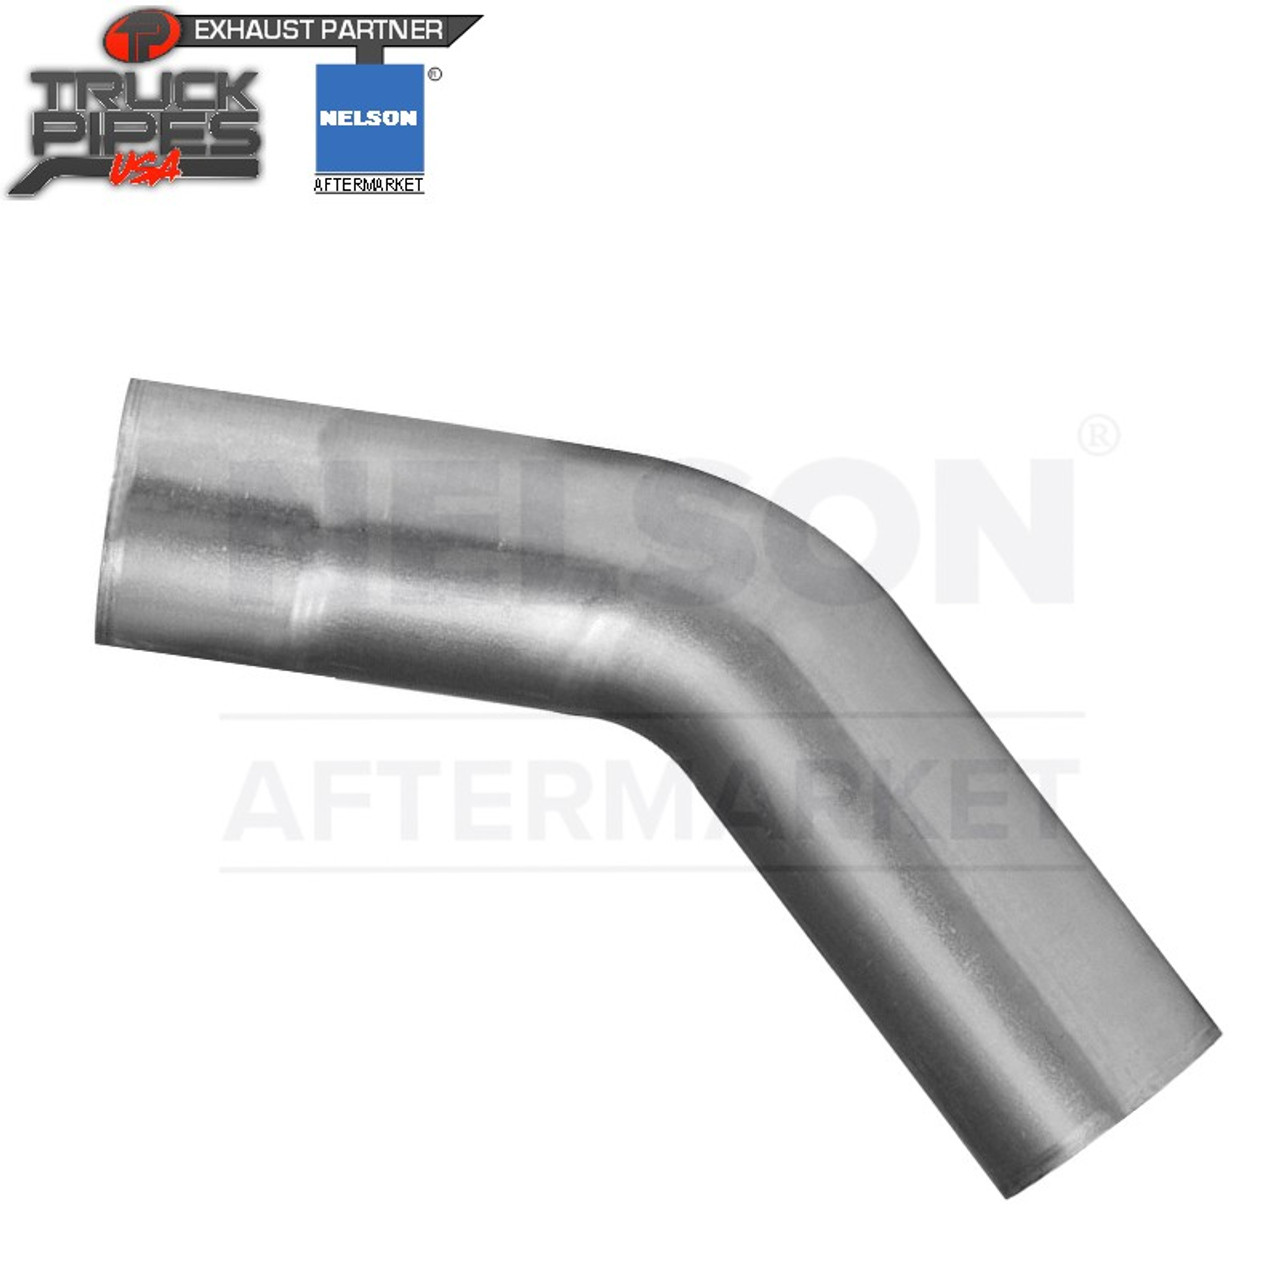 "6"" OD-OD 45 Degree Exhaust Elbow Aluminized x 8"" Leg Length Nelson 900071A"